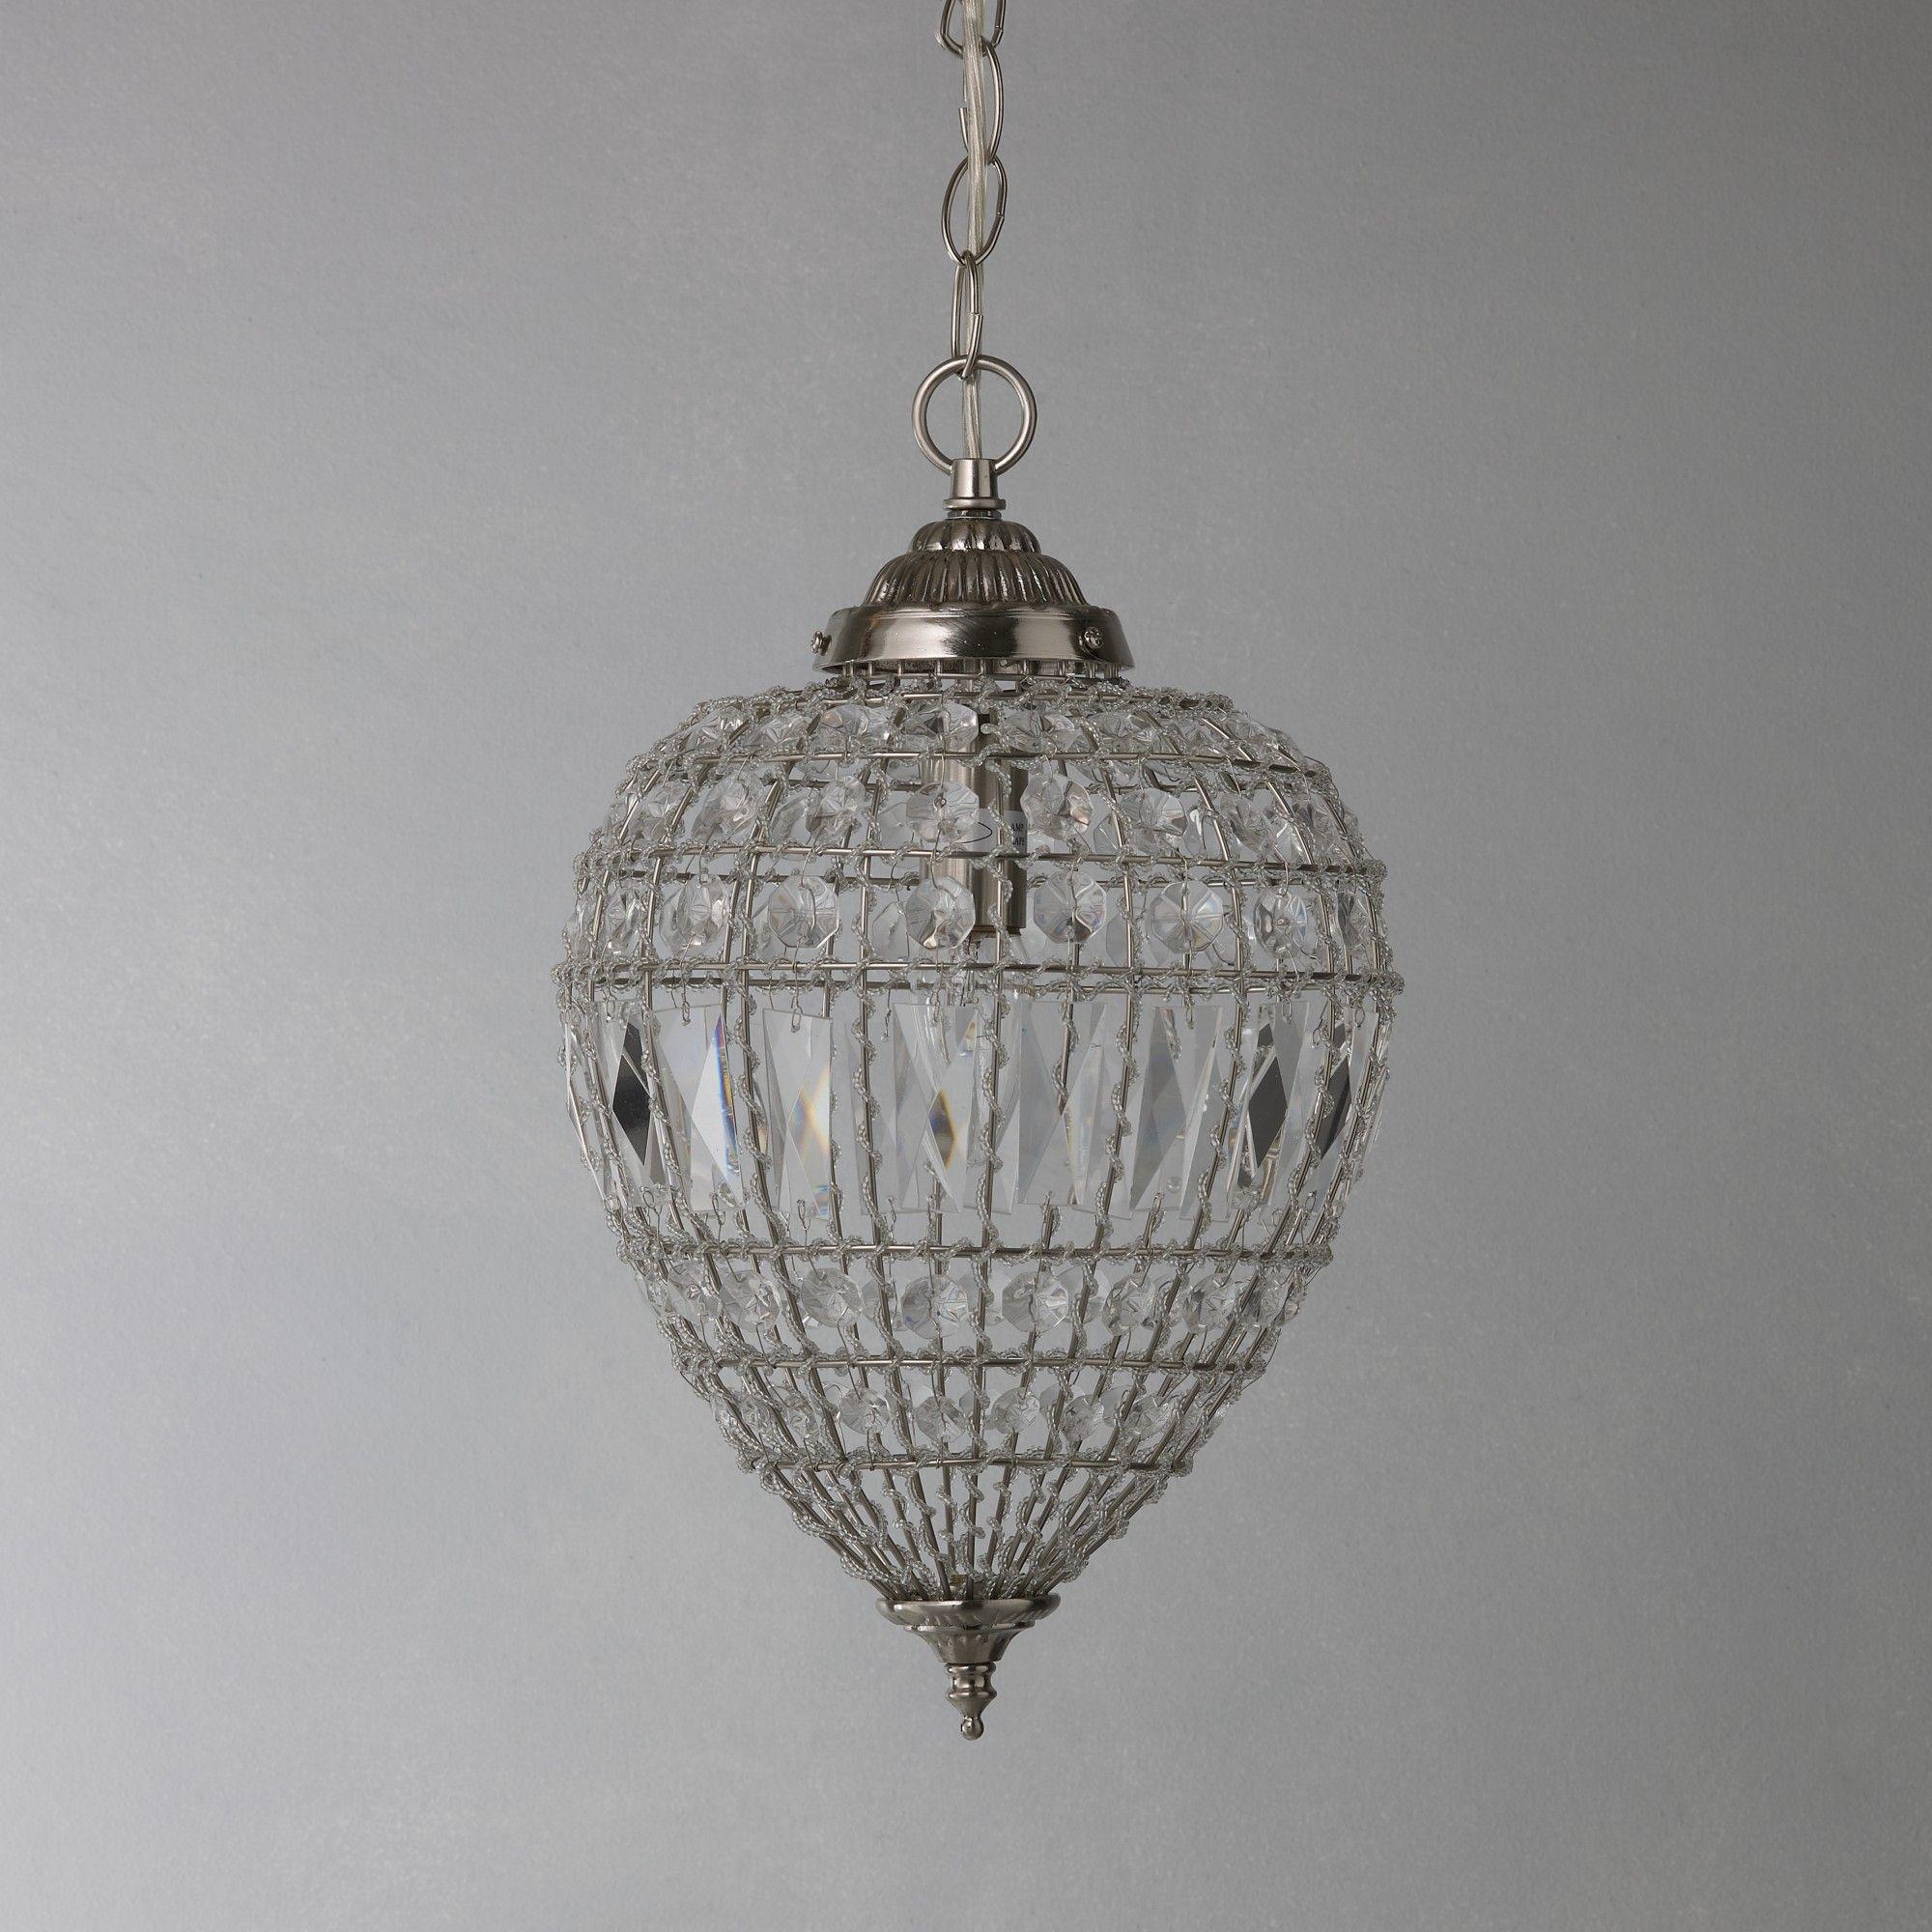 John lewis dante chandelier pendant john lewis chandeliers and buy john lewis dante chandelier pendant online at johnlewis arubaitofo Image collections